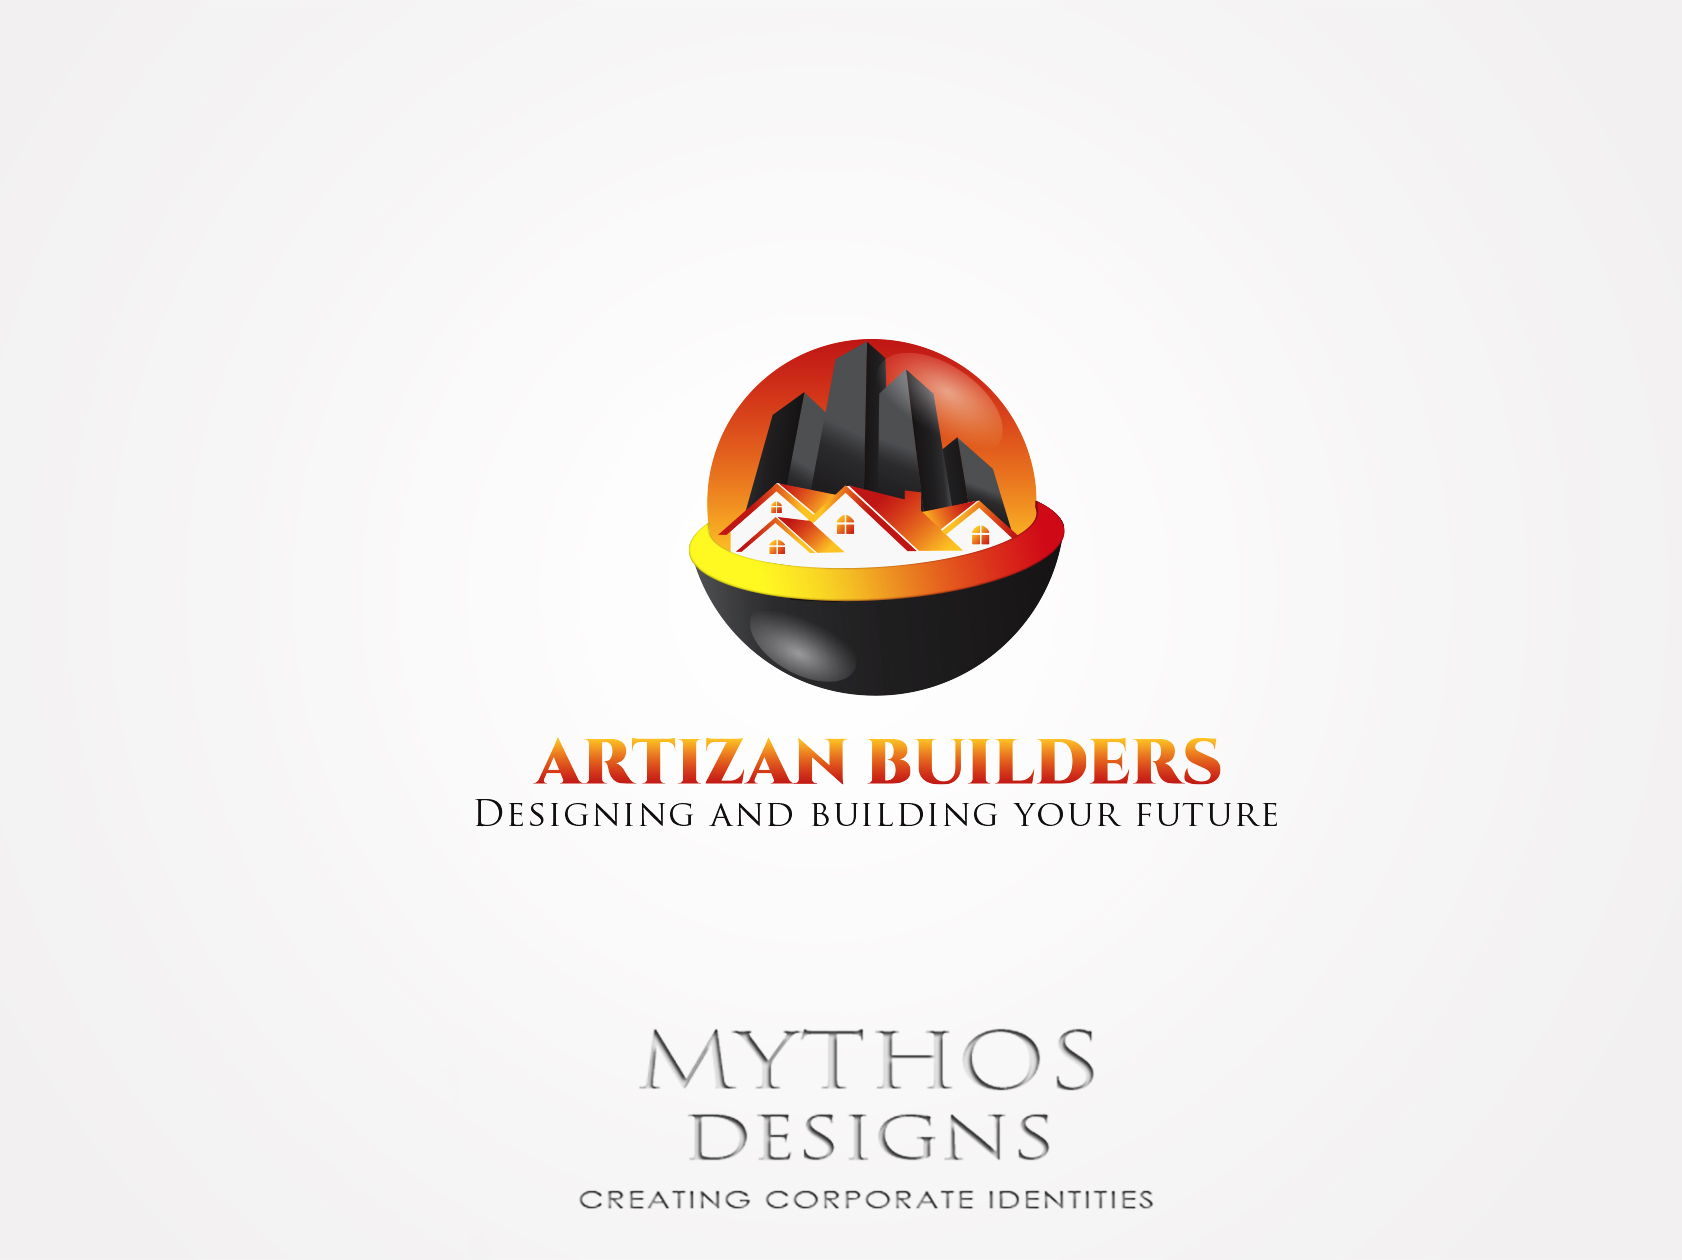 Logo Design by Mythos Designs - Entry No. 163 in the Logo Design Contest Captivating Logo Design for Artisan Builders.